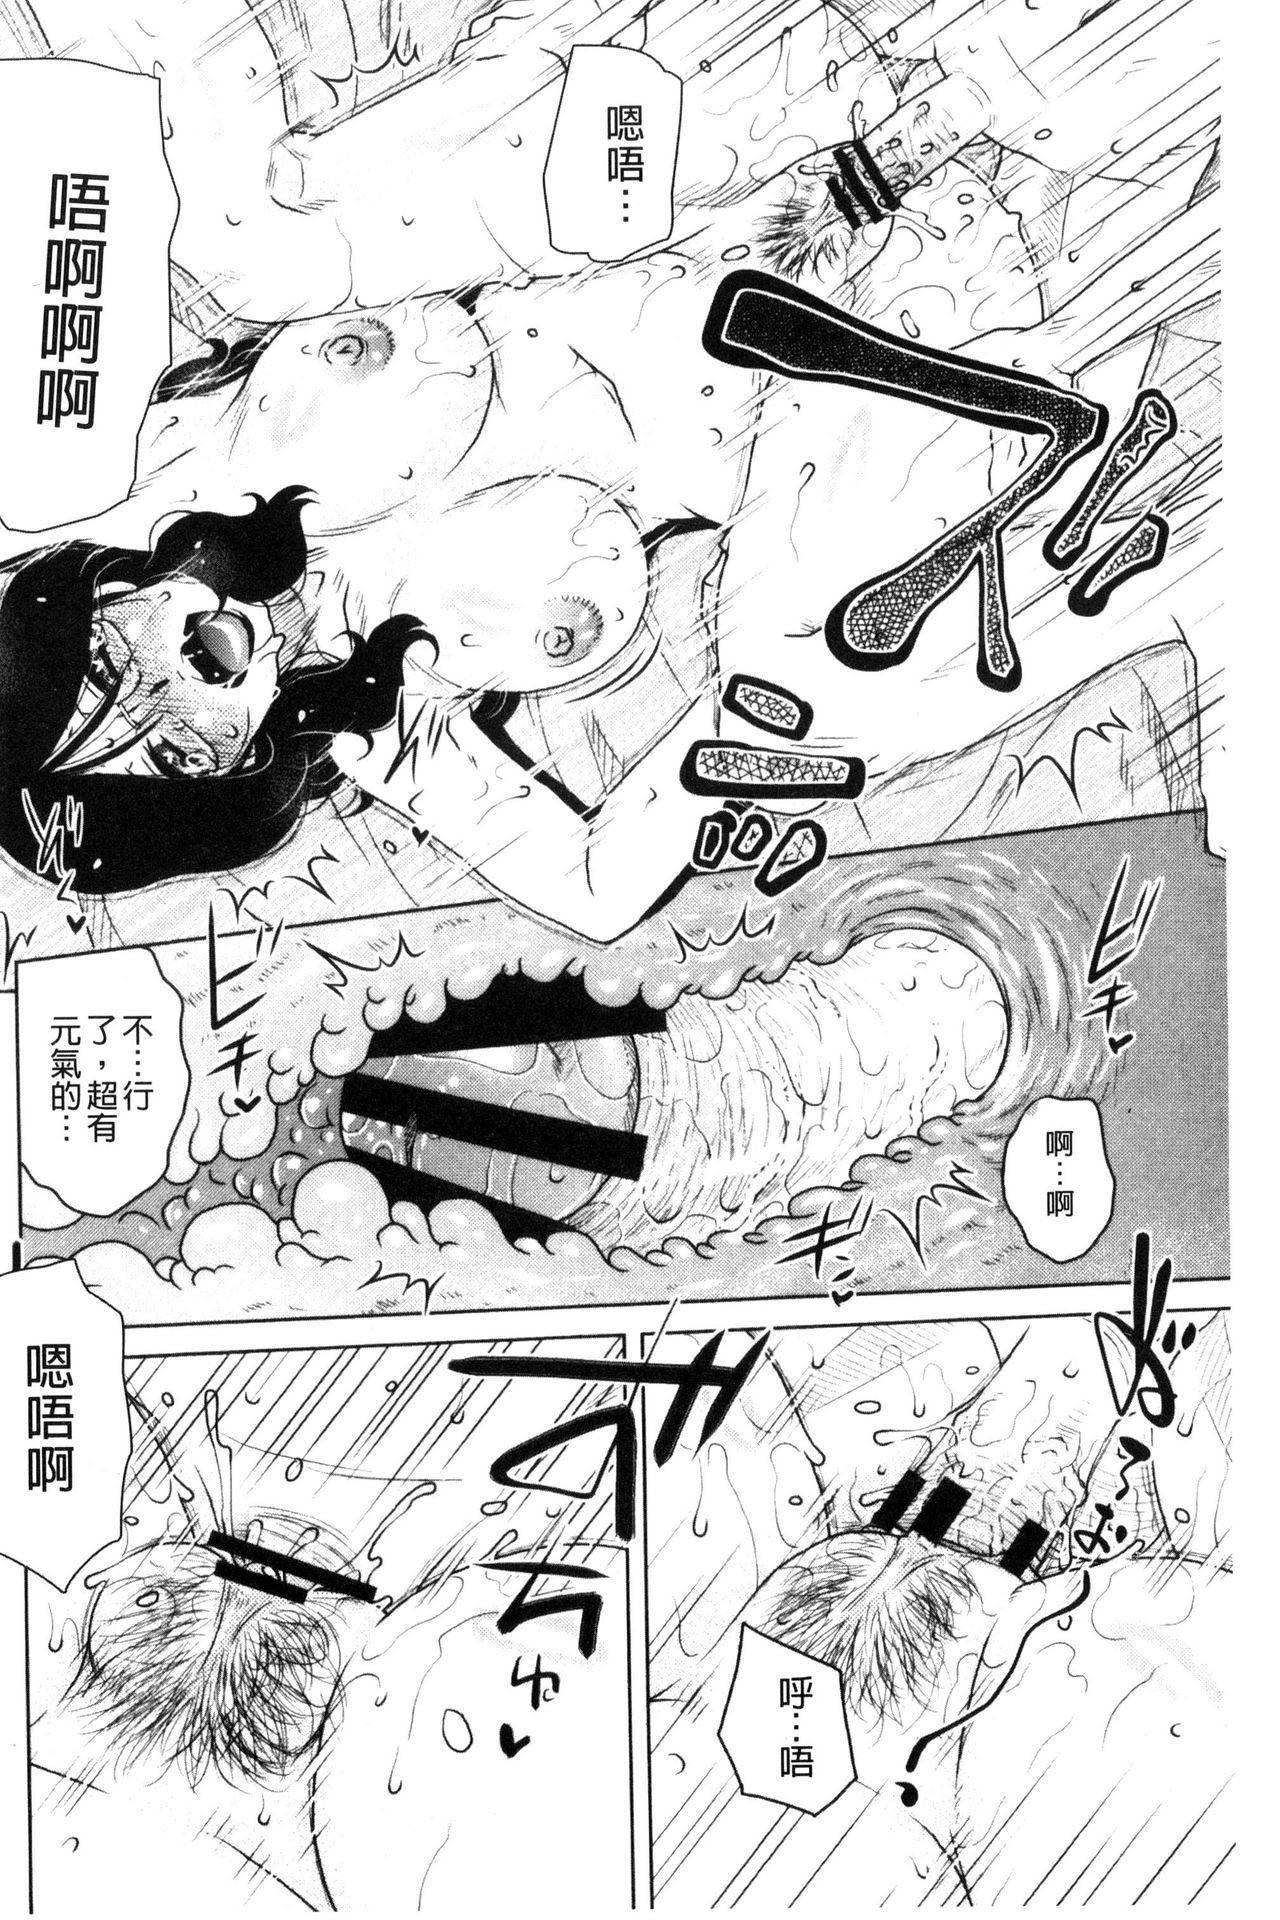 [Kurumiya Mashimin] Uchi no Shachou no Hamedere Inkatsu - Our President is HAME-DERE in Licentious sex life. [Chinese] 102